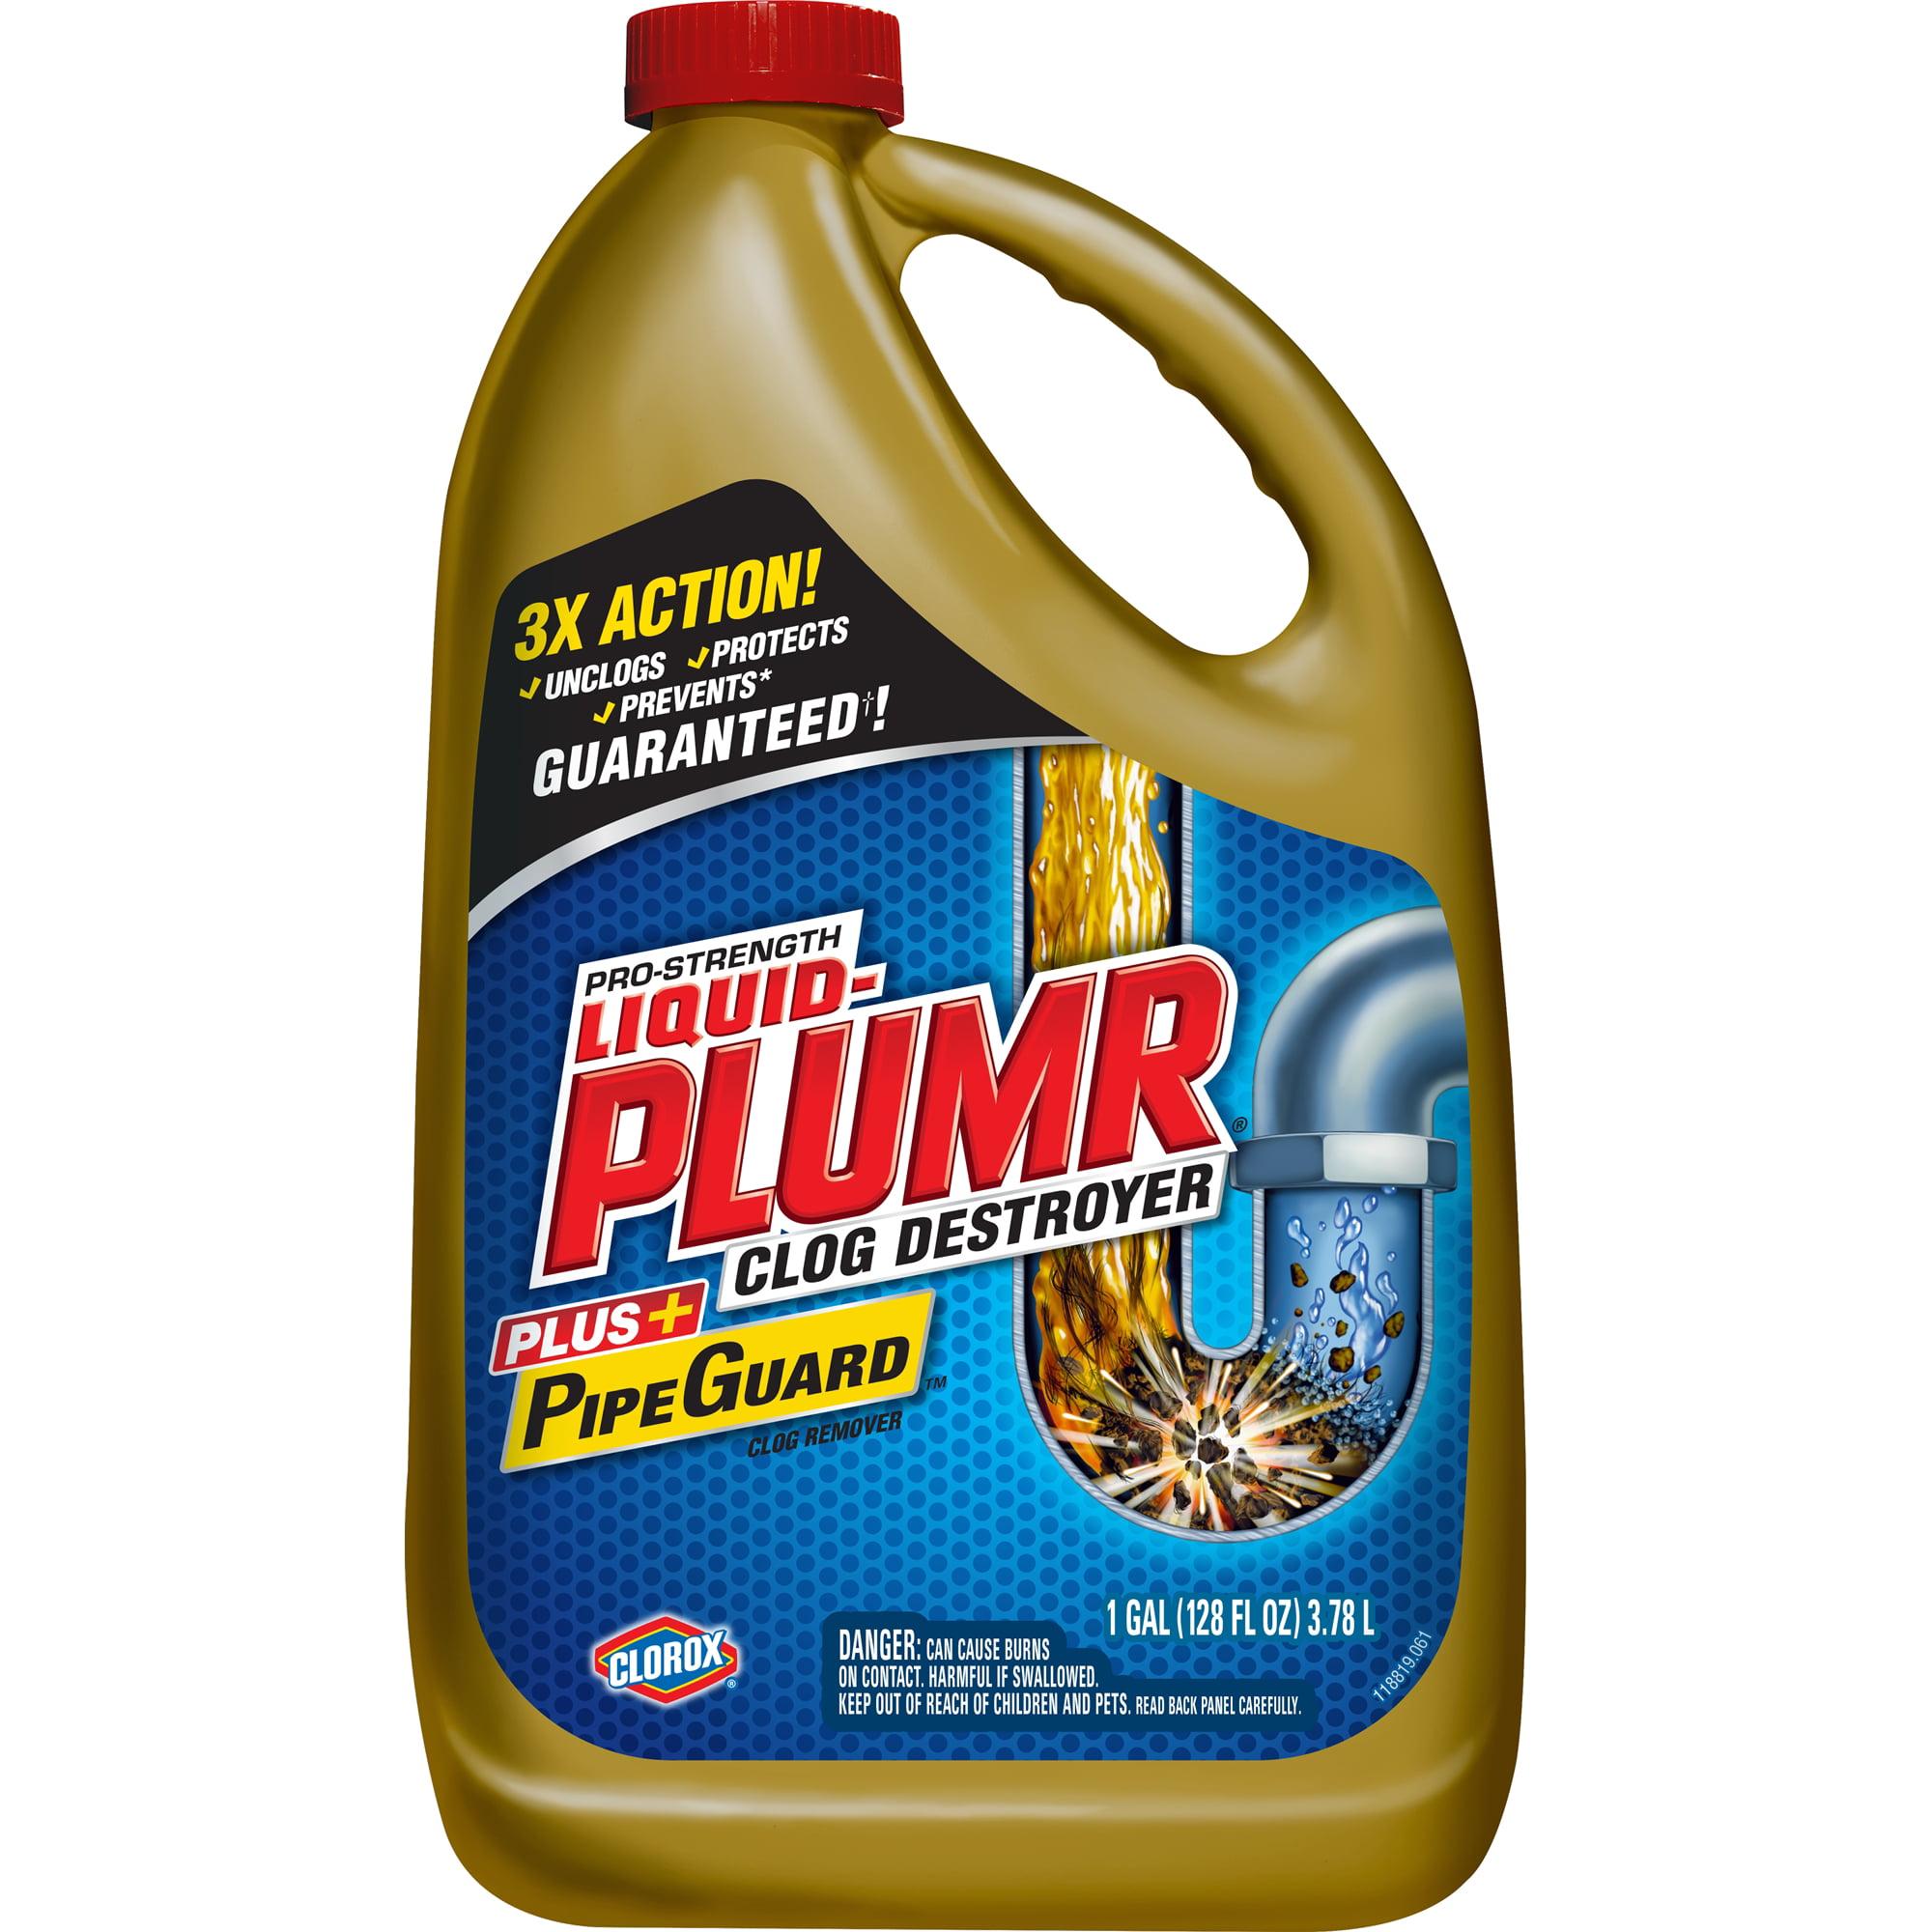 Liquid-Plumr Pro-Strength Full Clog Destroyer Plus PipeGuard, 128 oz